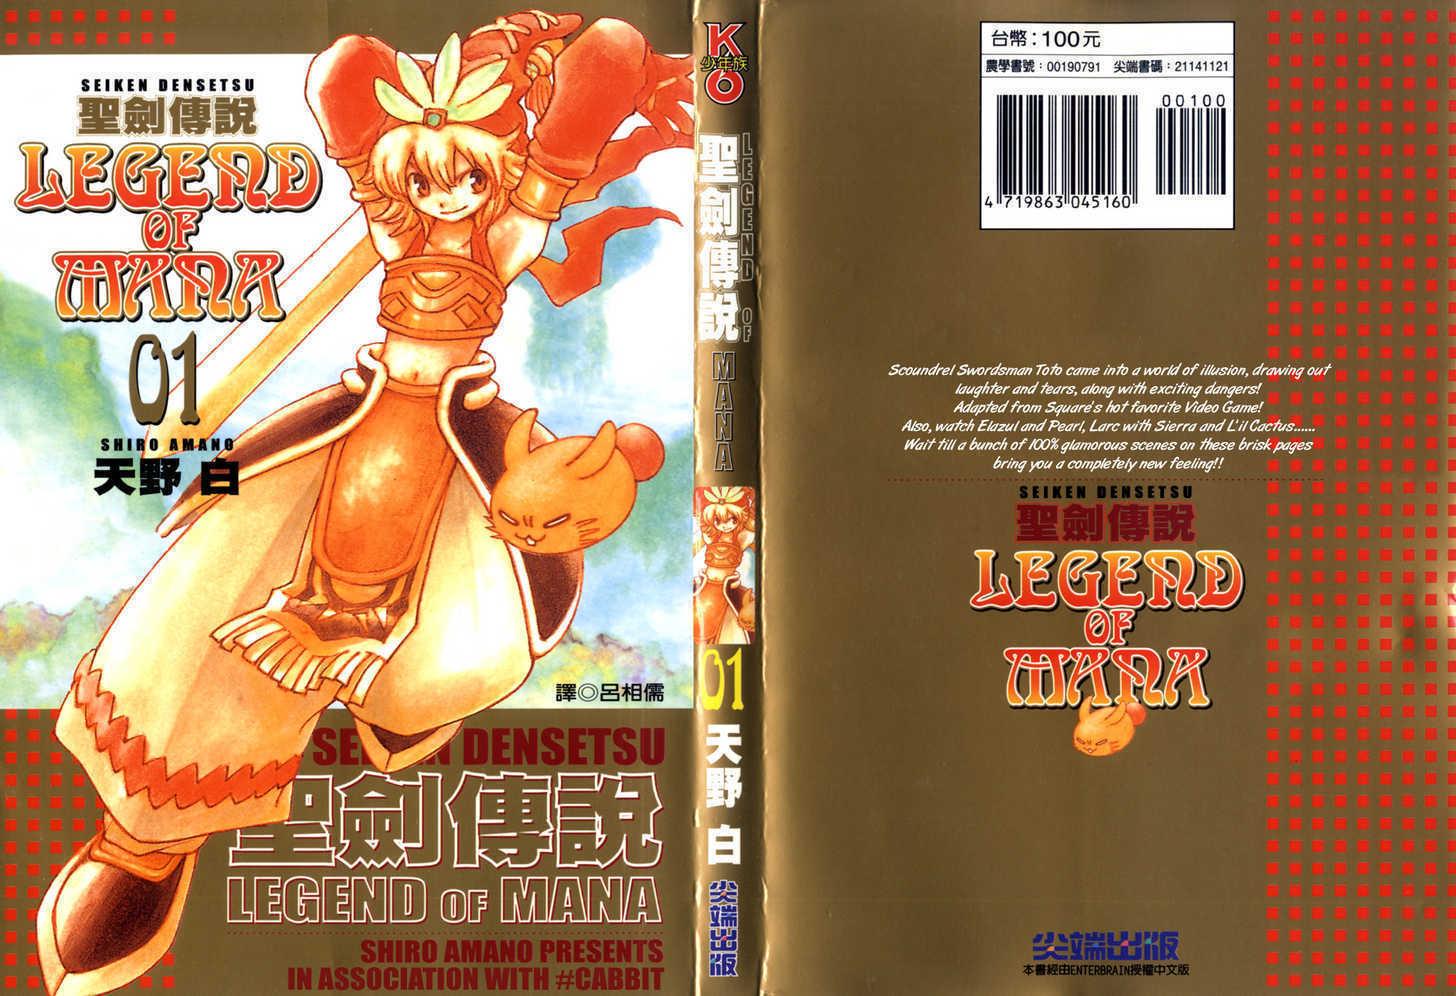 Seiken Densetsu: Legend of Mana 1 Page 1